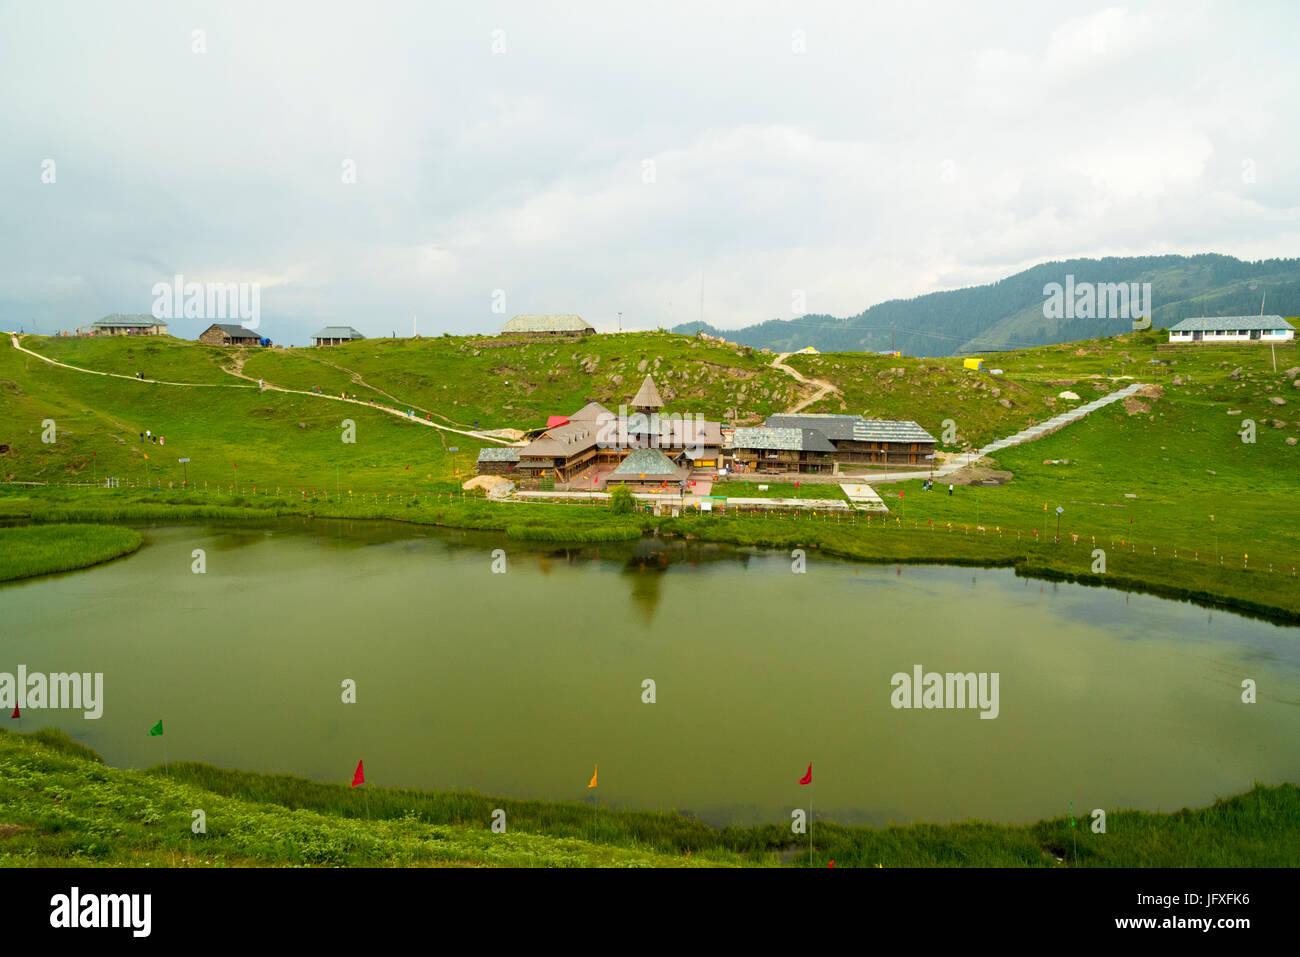 Ancient Prashar Lake Temple view with Prashar Holy water Pond and Green nature landscape at Prashar Lake, Mandi - Stock Image